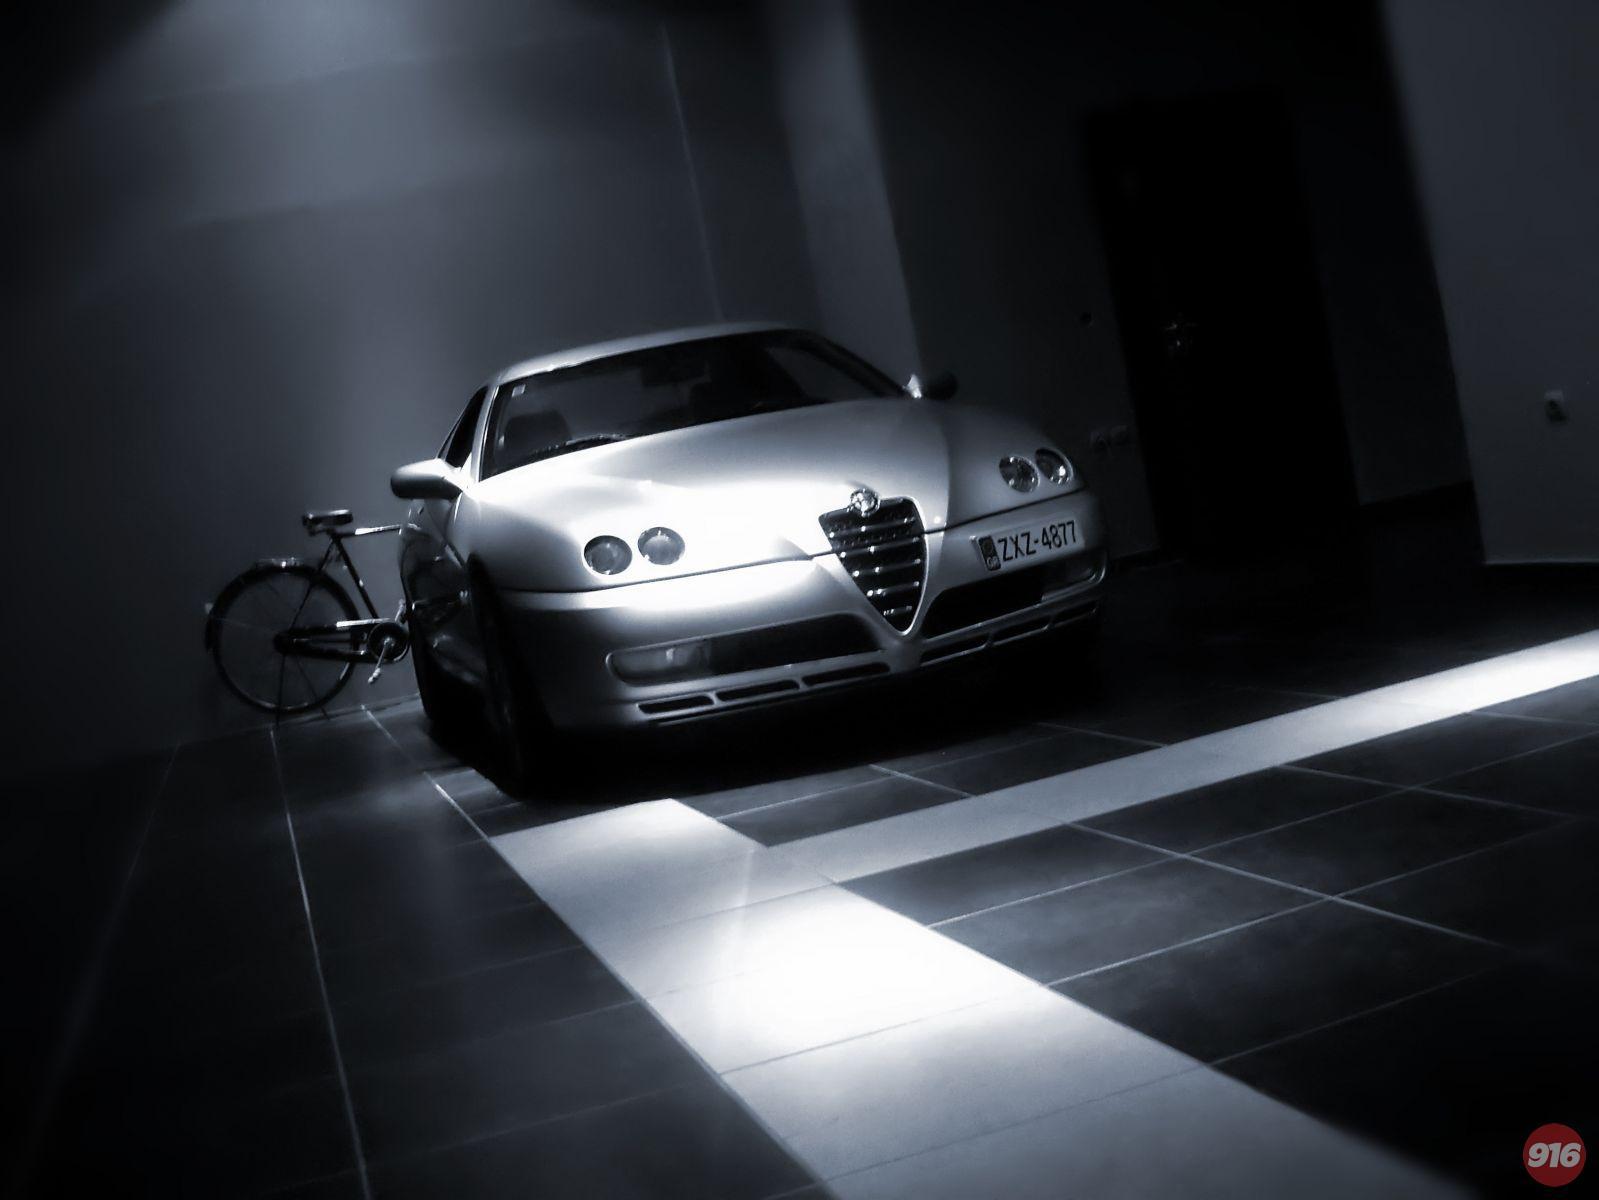 Alfa Romeo Gtv 3.2 V6 24V sleeping at the garage....